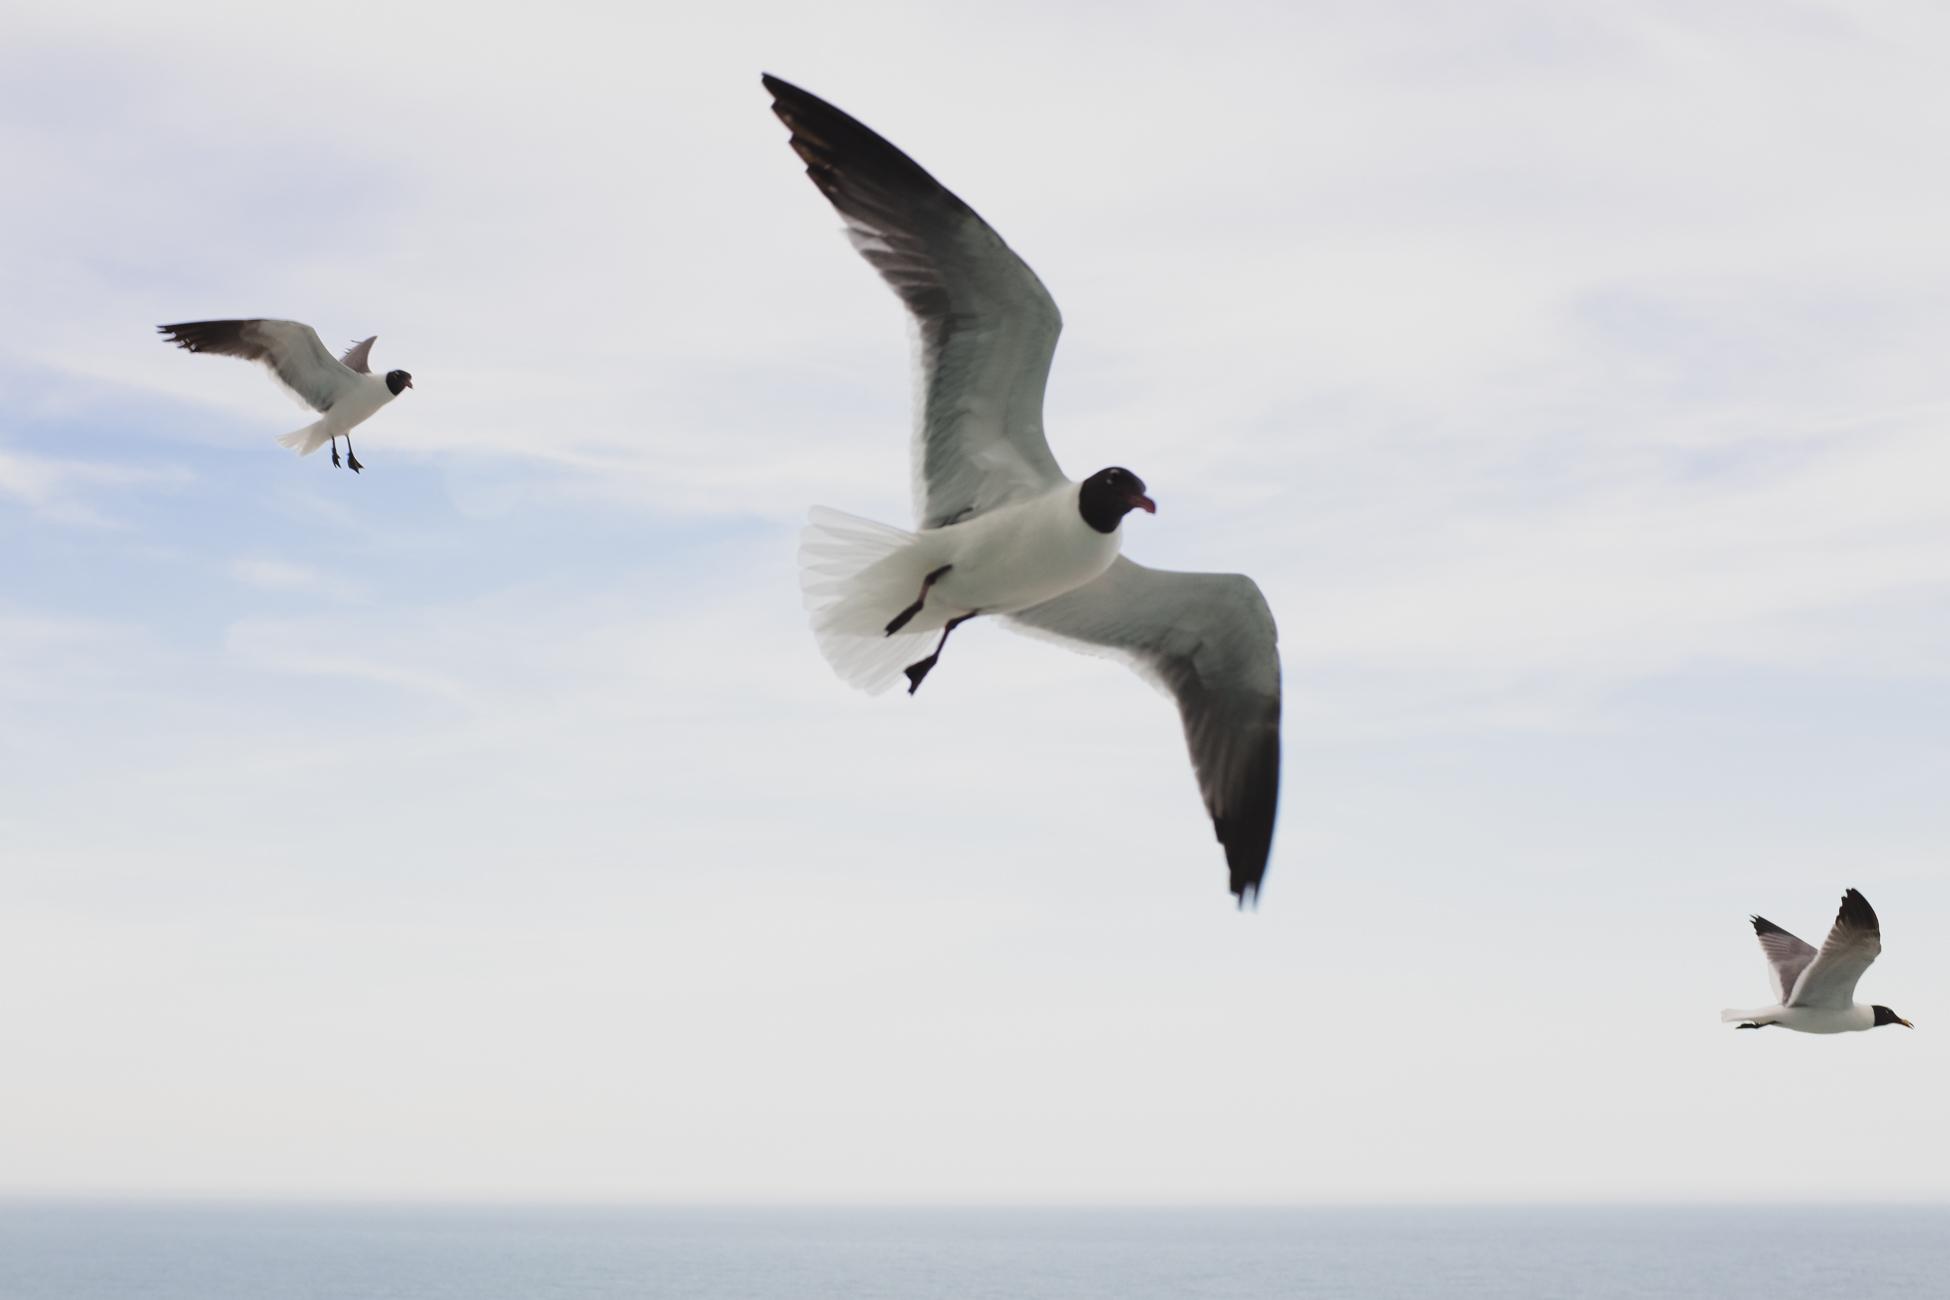 Seagulls, Maryland, 2015